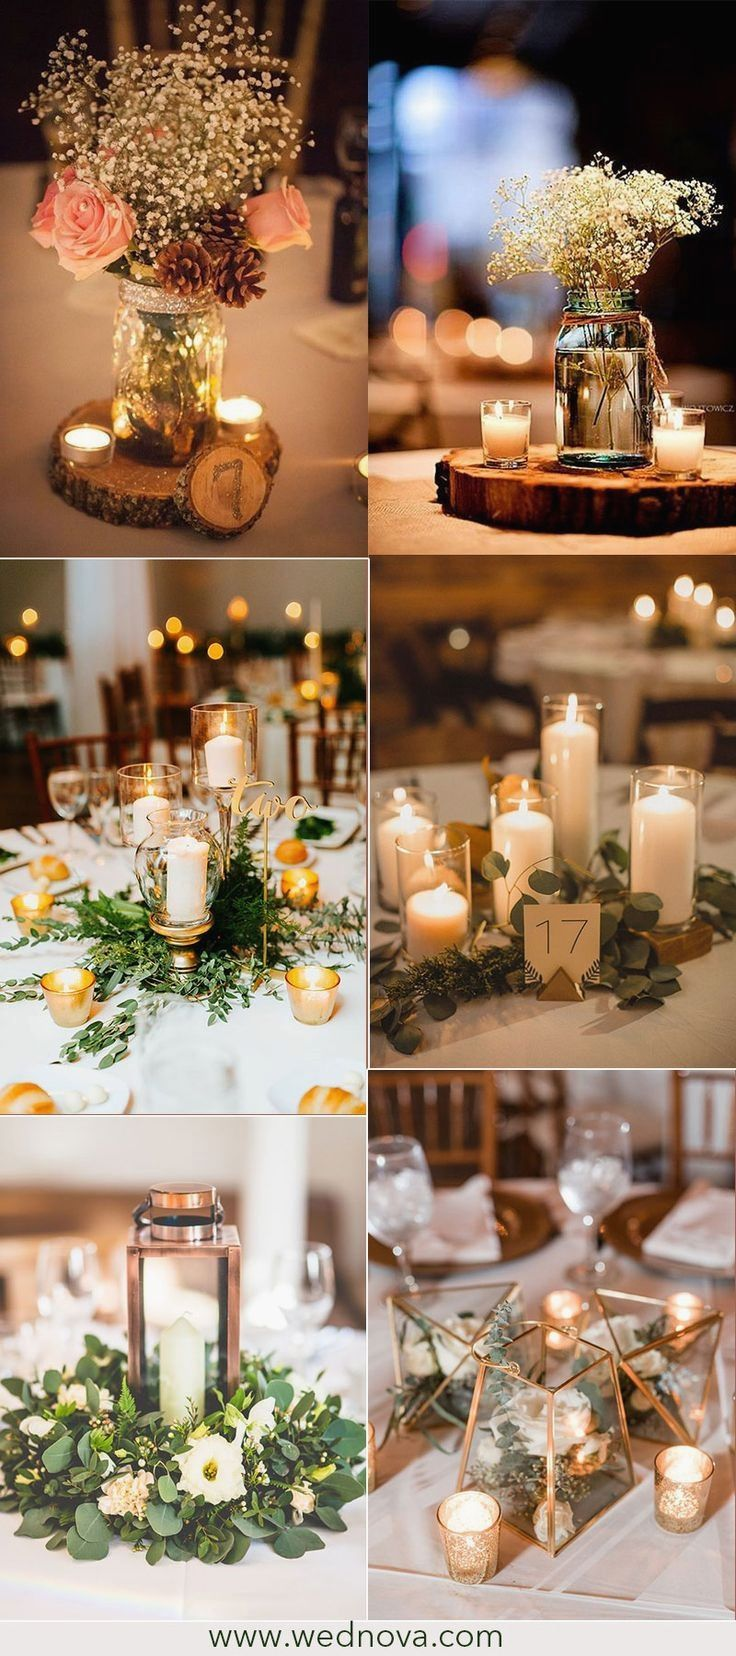 Center Table Decoration Ideas Wedding Table Decorations Wedding Decor Elegant Flower Centerpieces Wedding